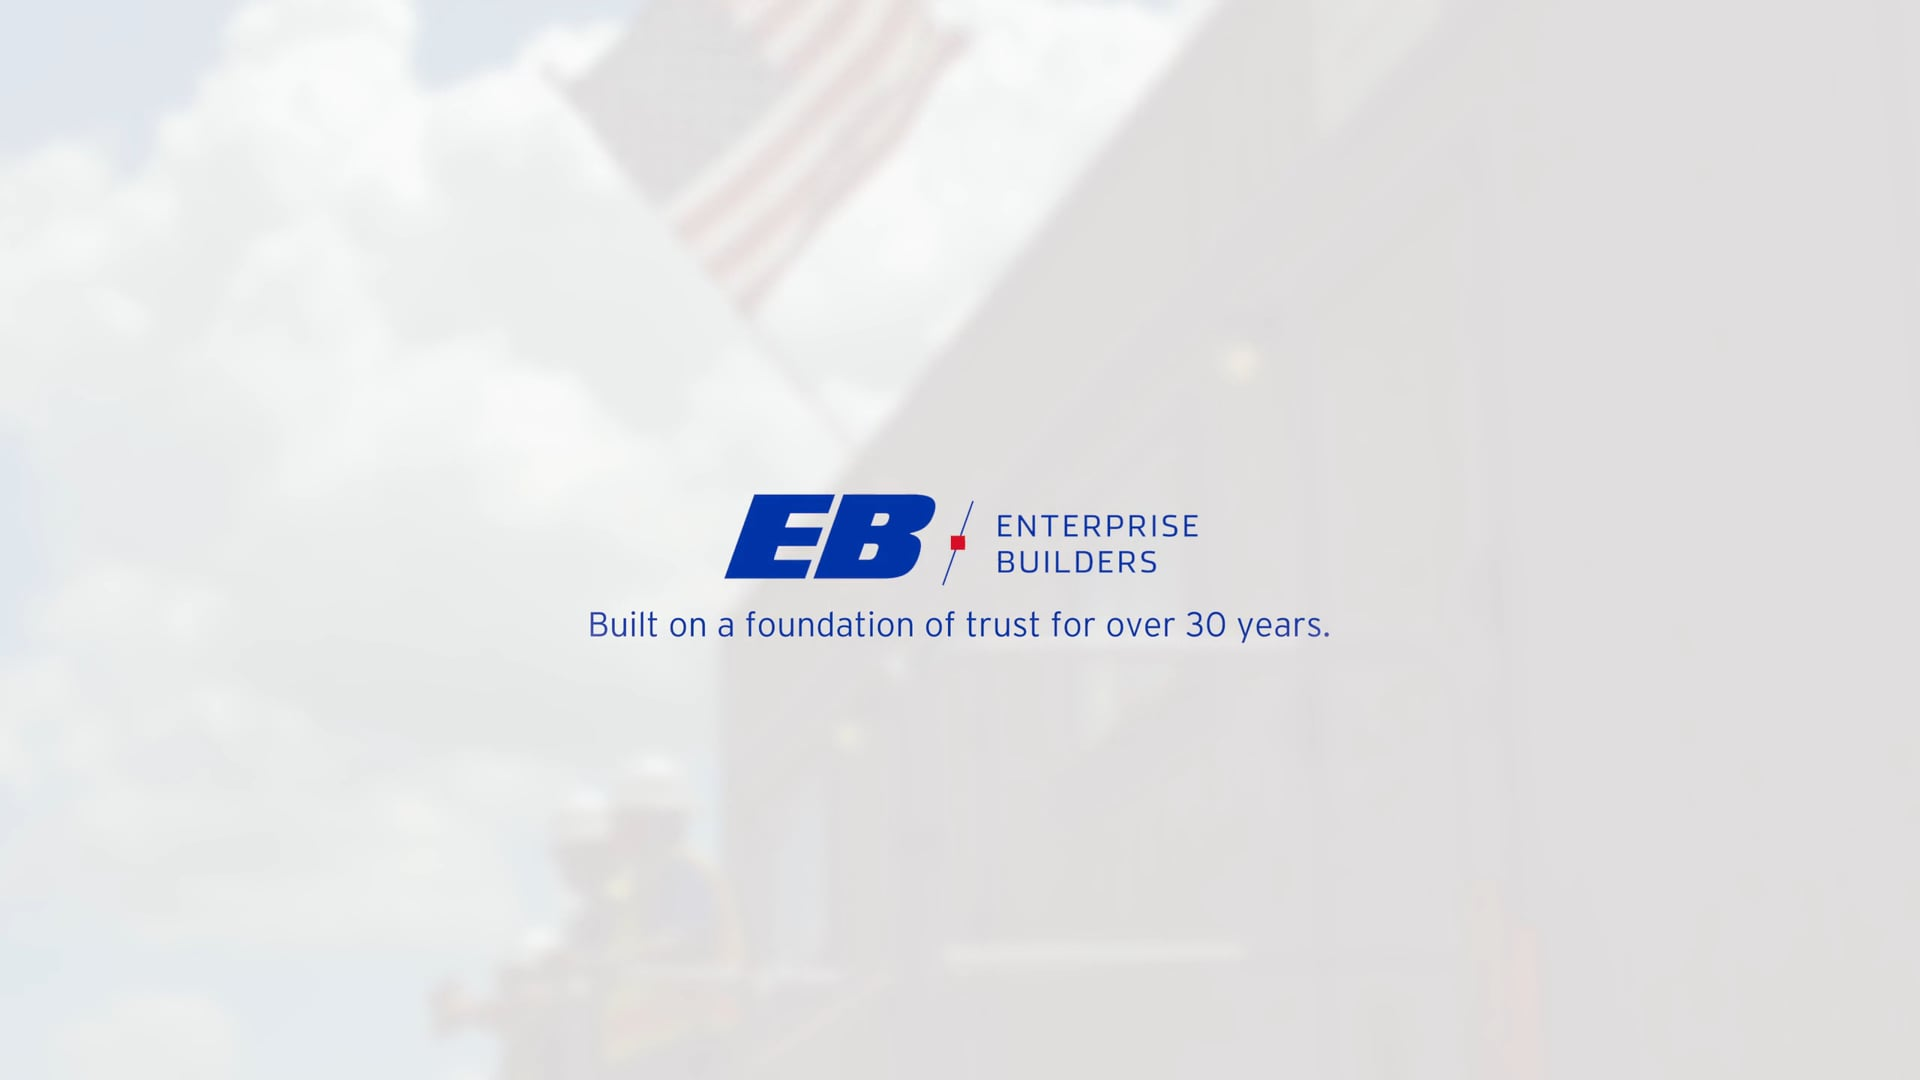 EnterpriseBuilders_03